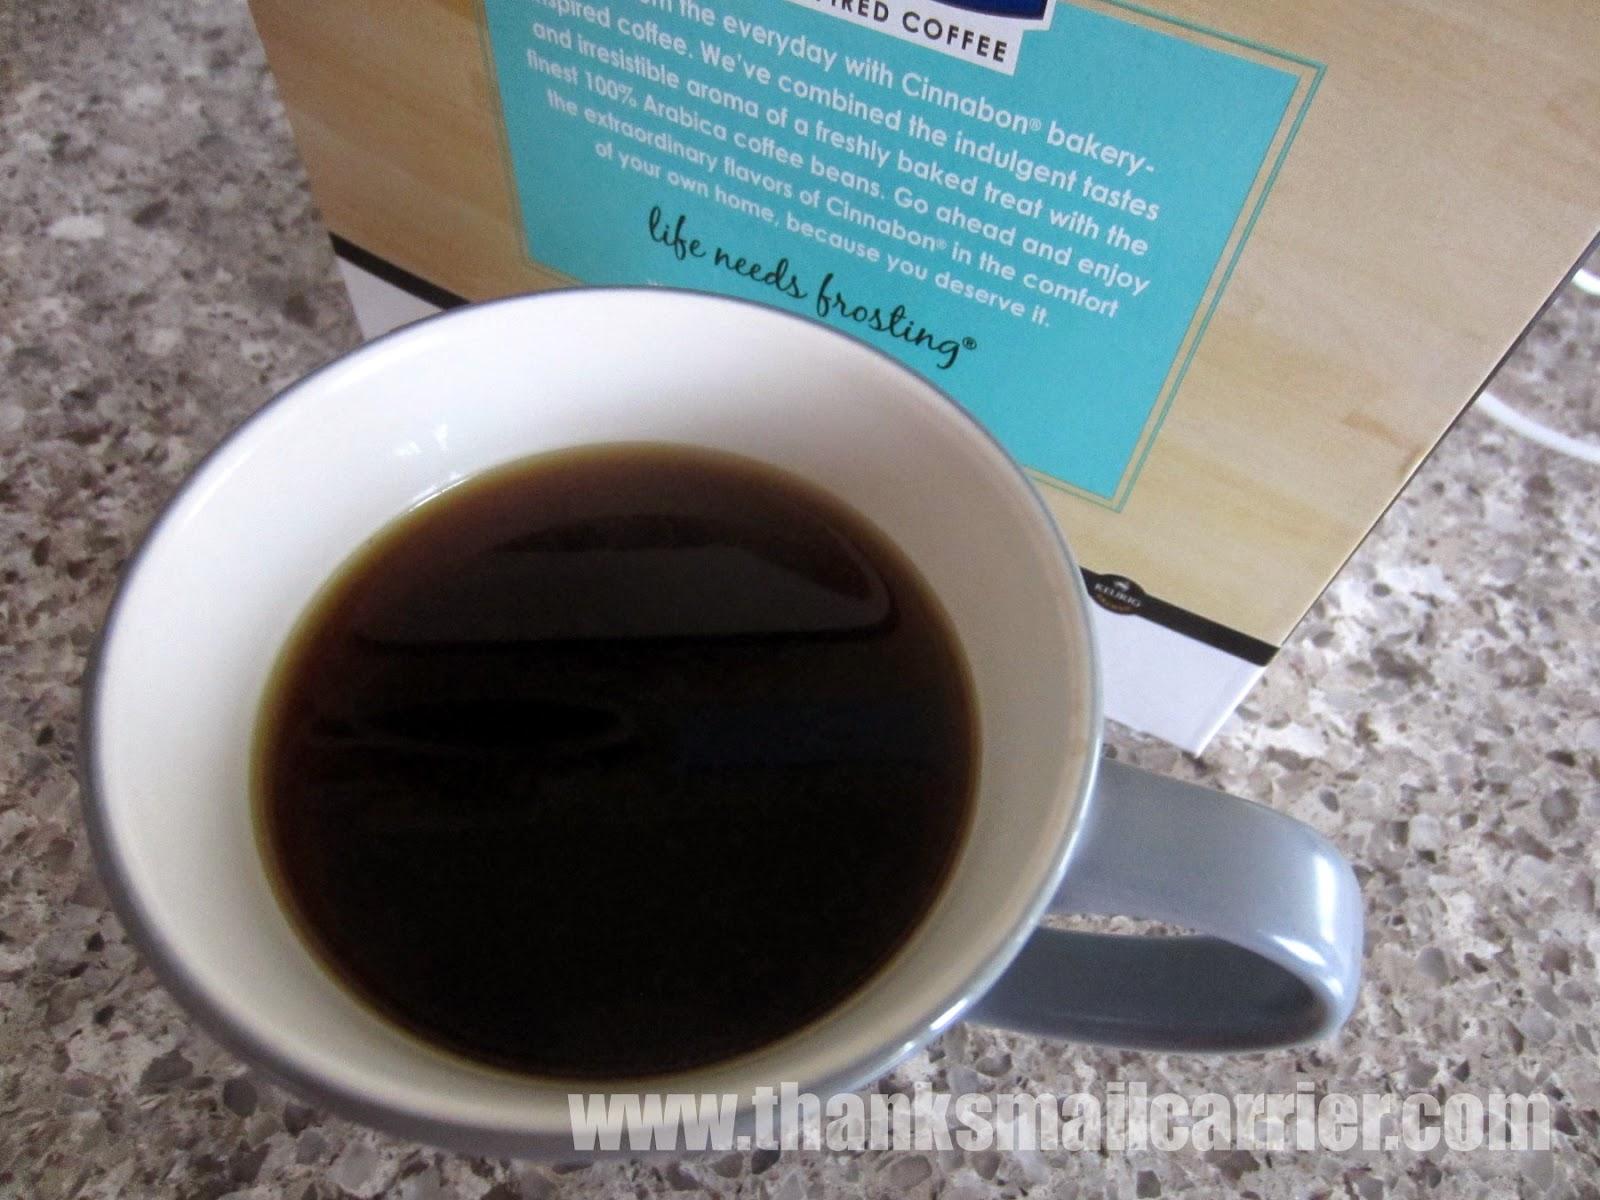 Cinnabon cinnamon roll coffee